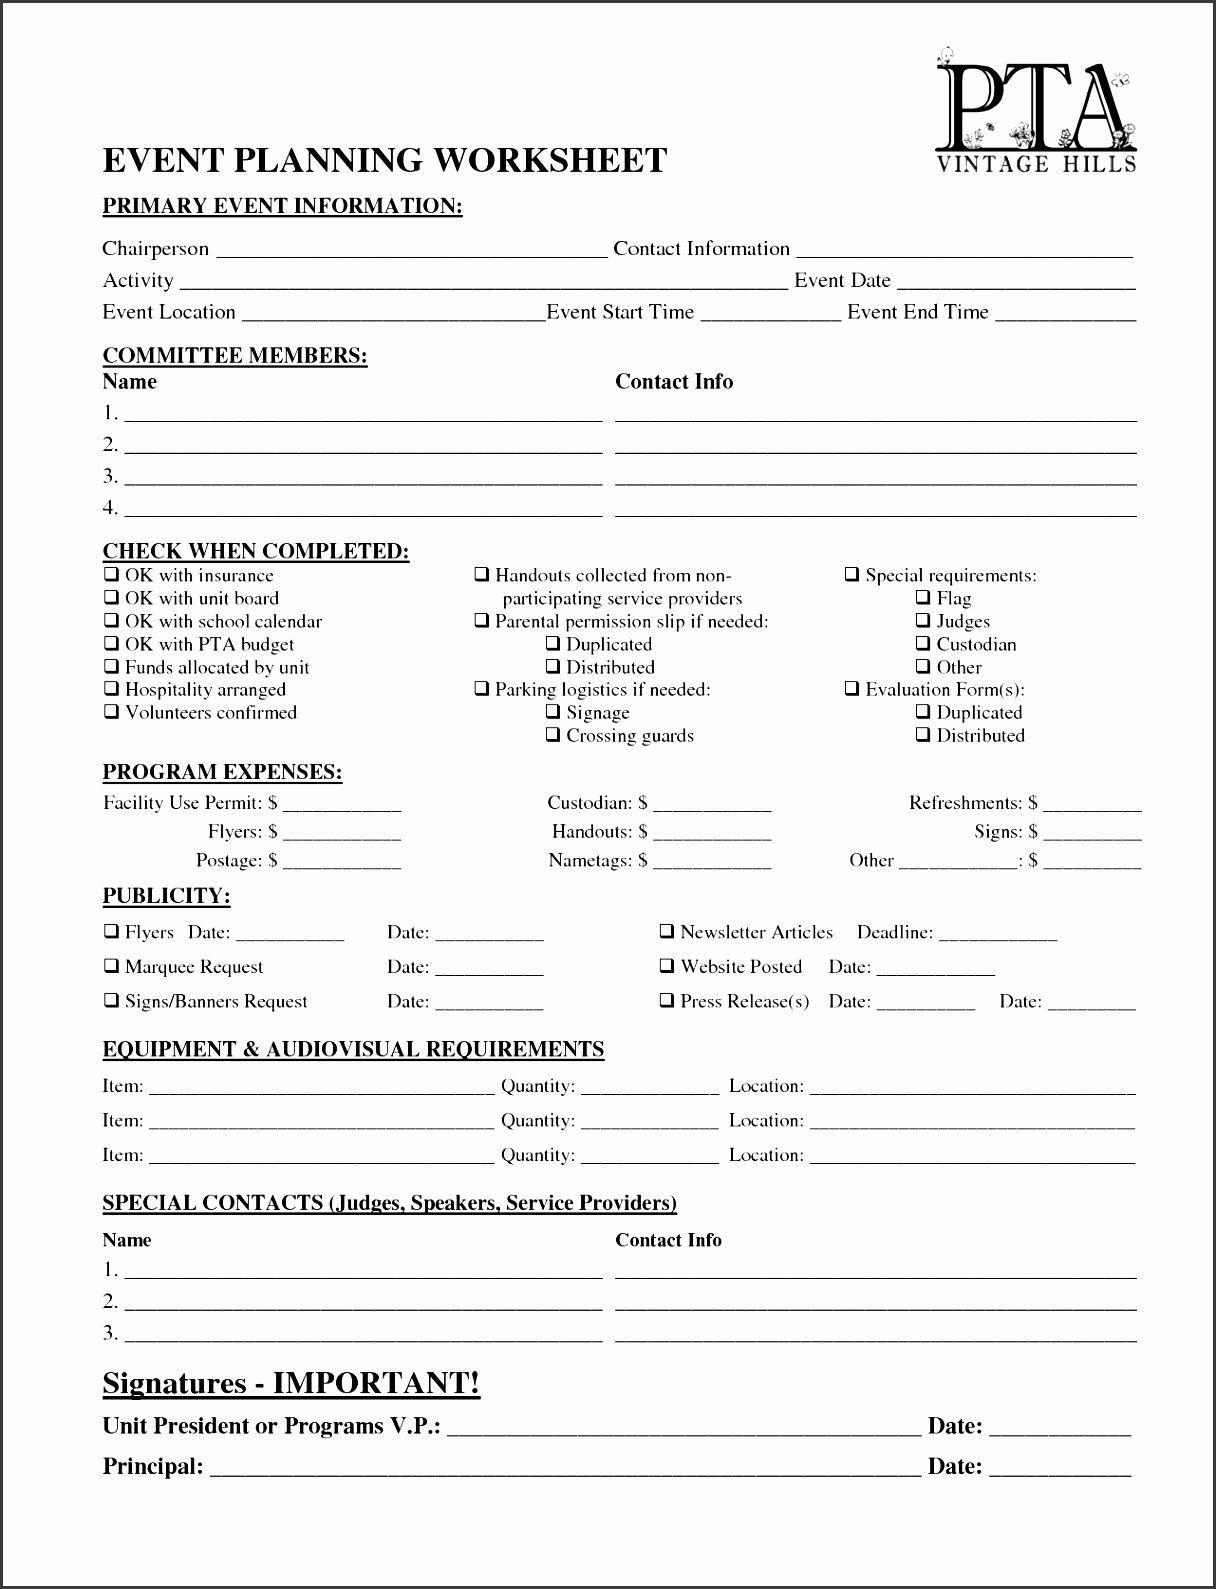 001 Simple Event Planning Worksheet Template Sample  Planner Checklist BudgetFull